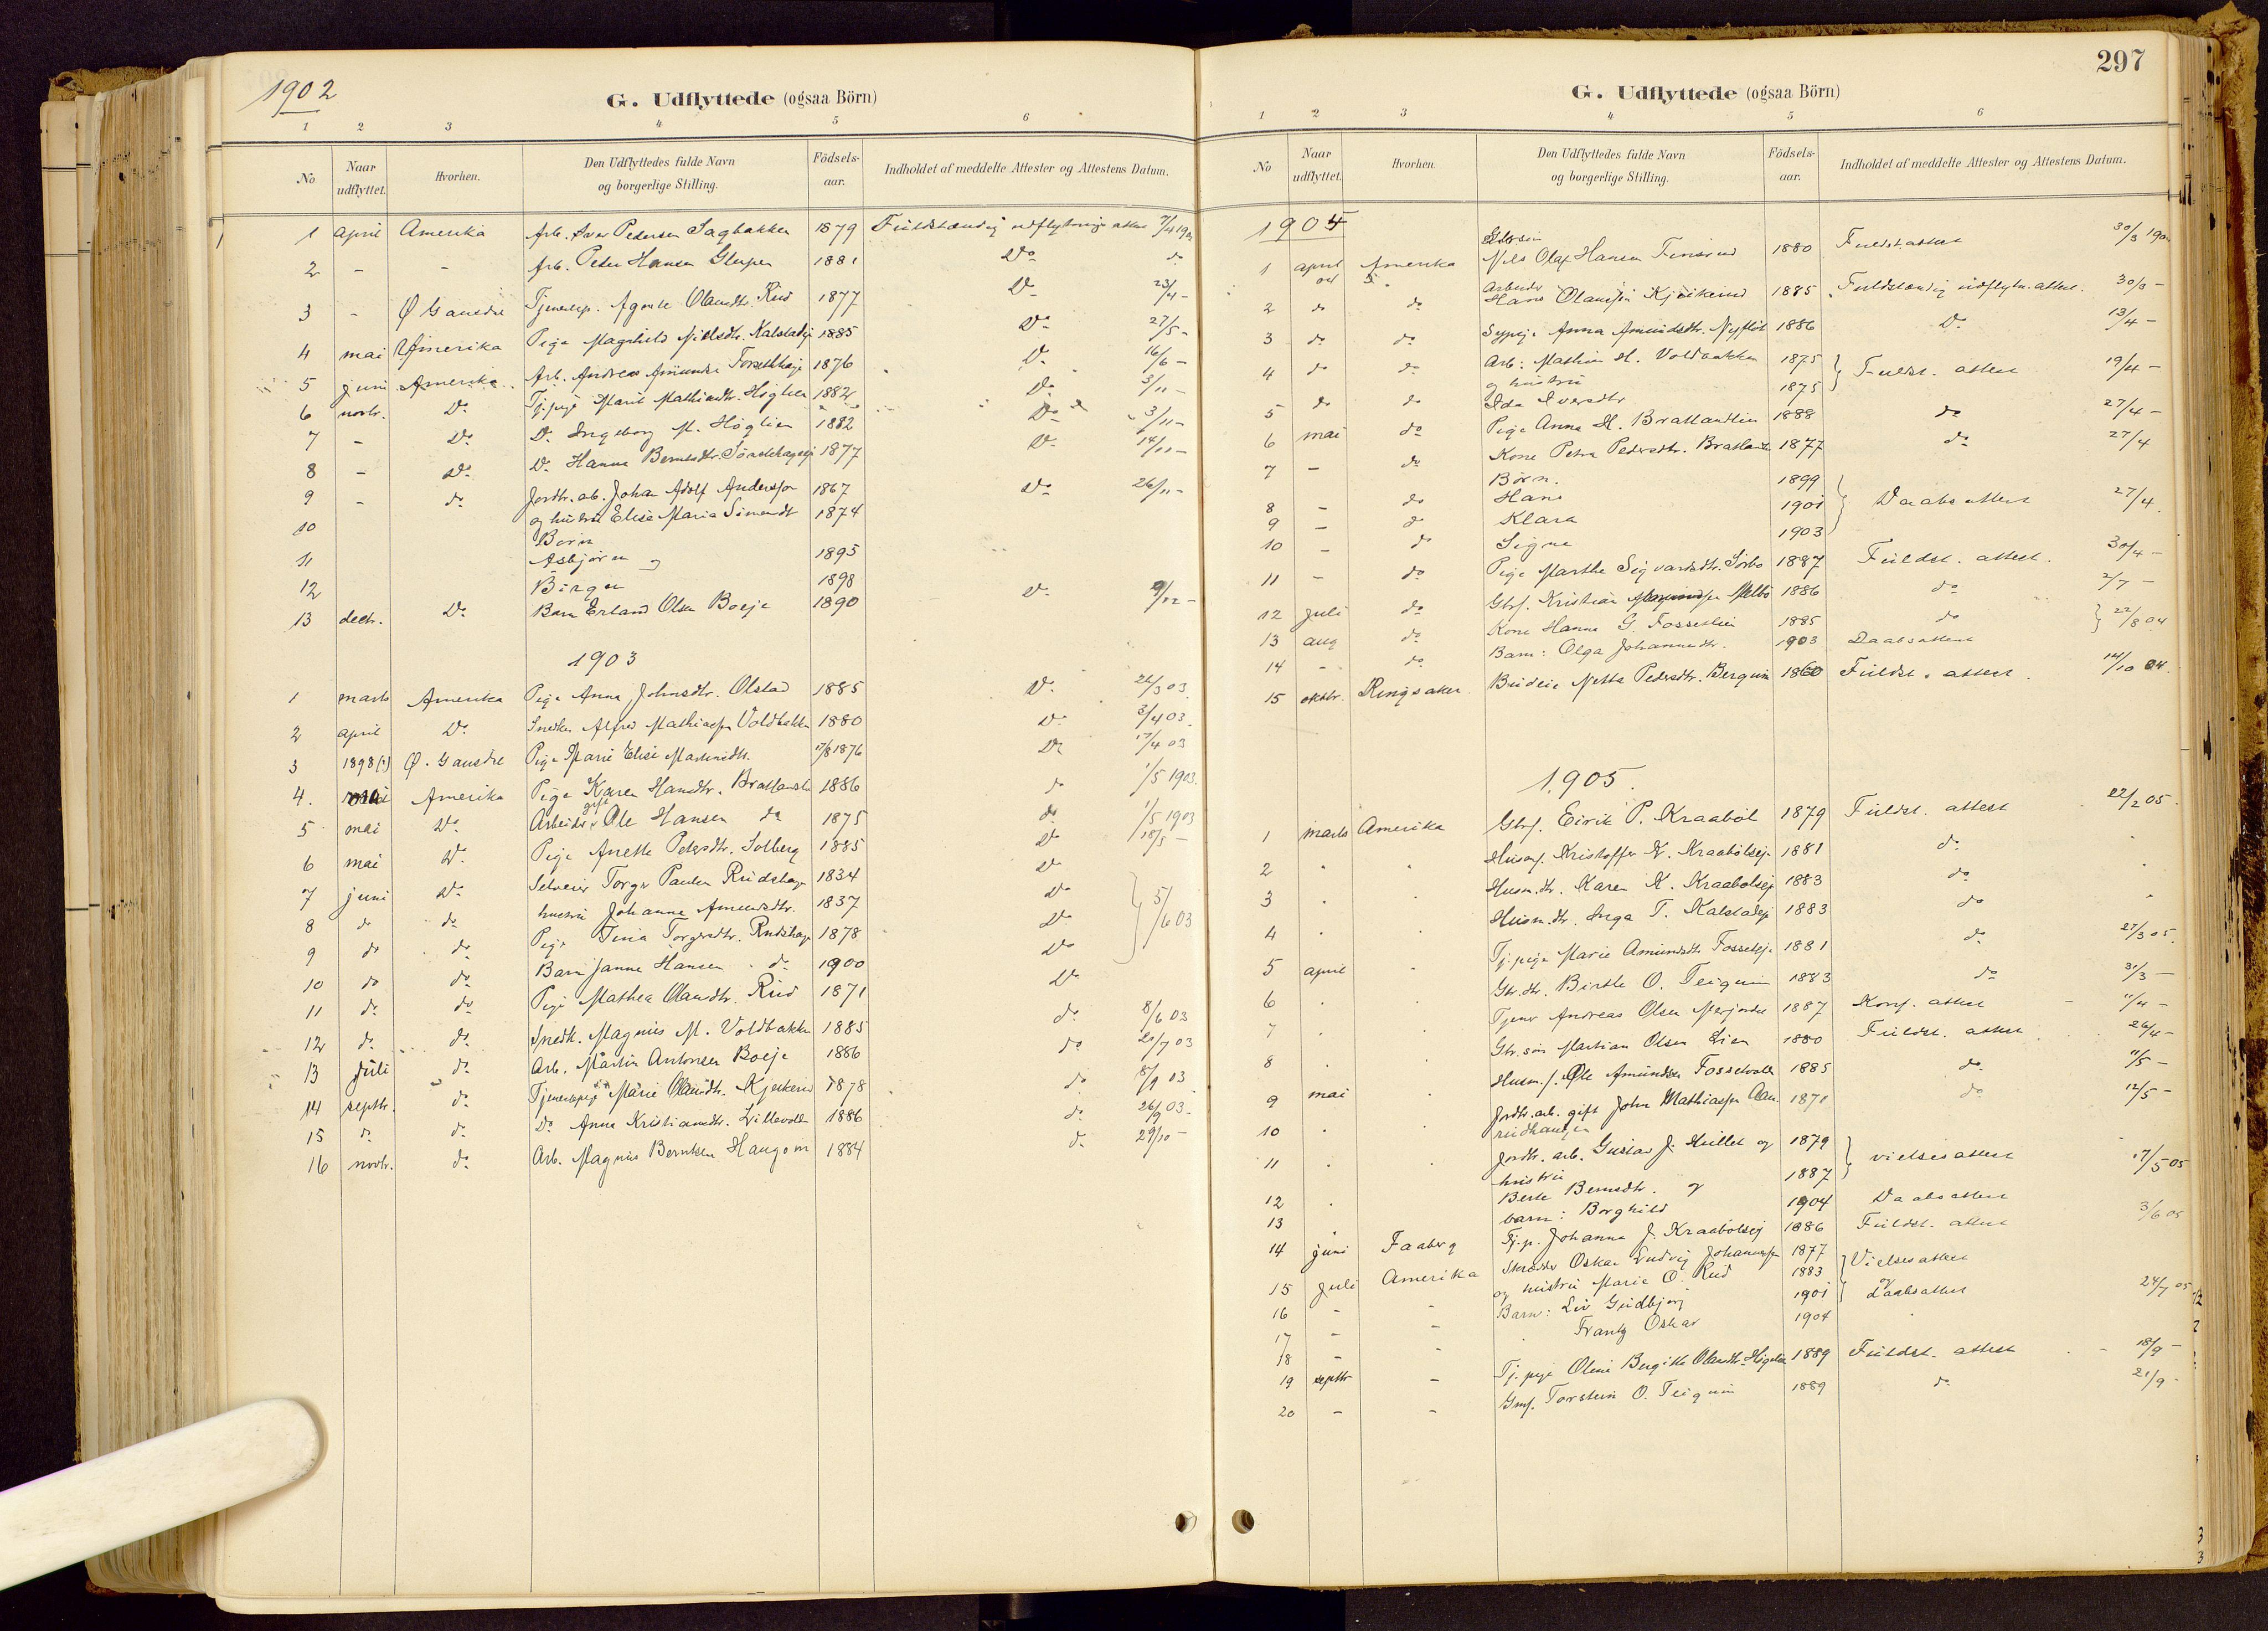 SAH, Vestre Gausdal prestekontor, Ministerialbok nr. 1, 1887-1914, s. 297